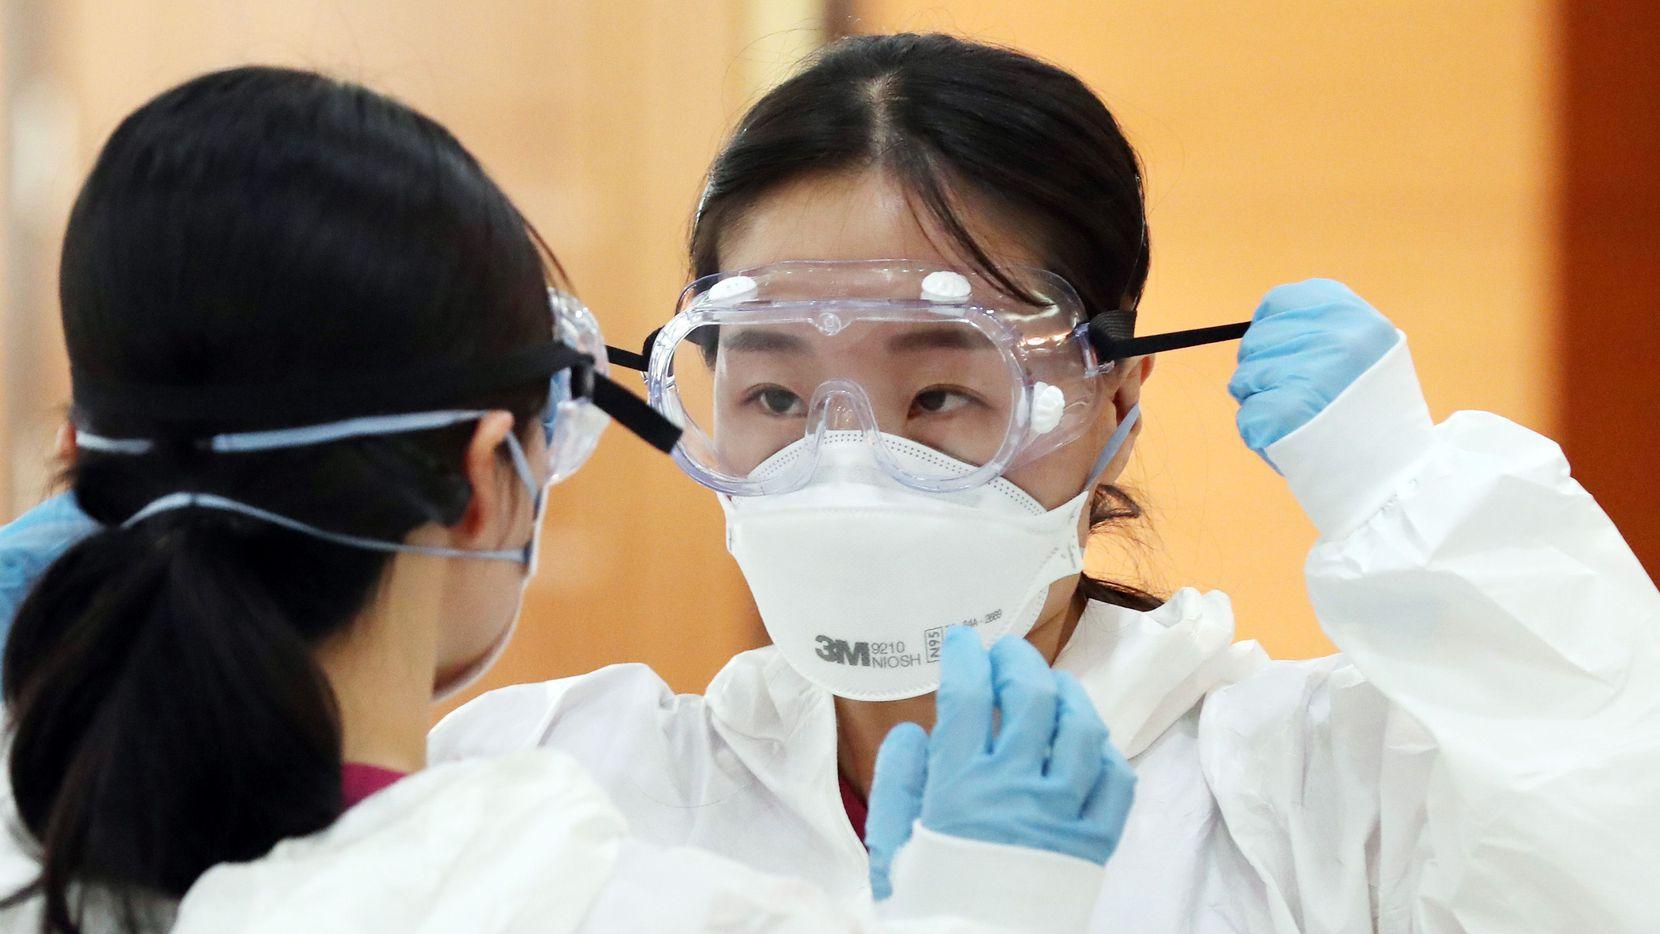 Dallas is ready for coronavirus, health experts say